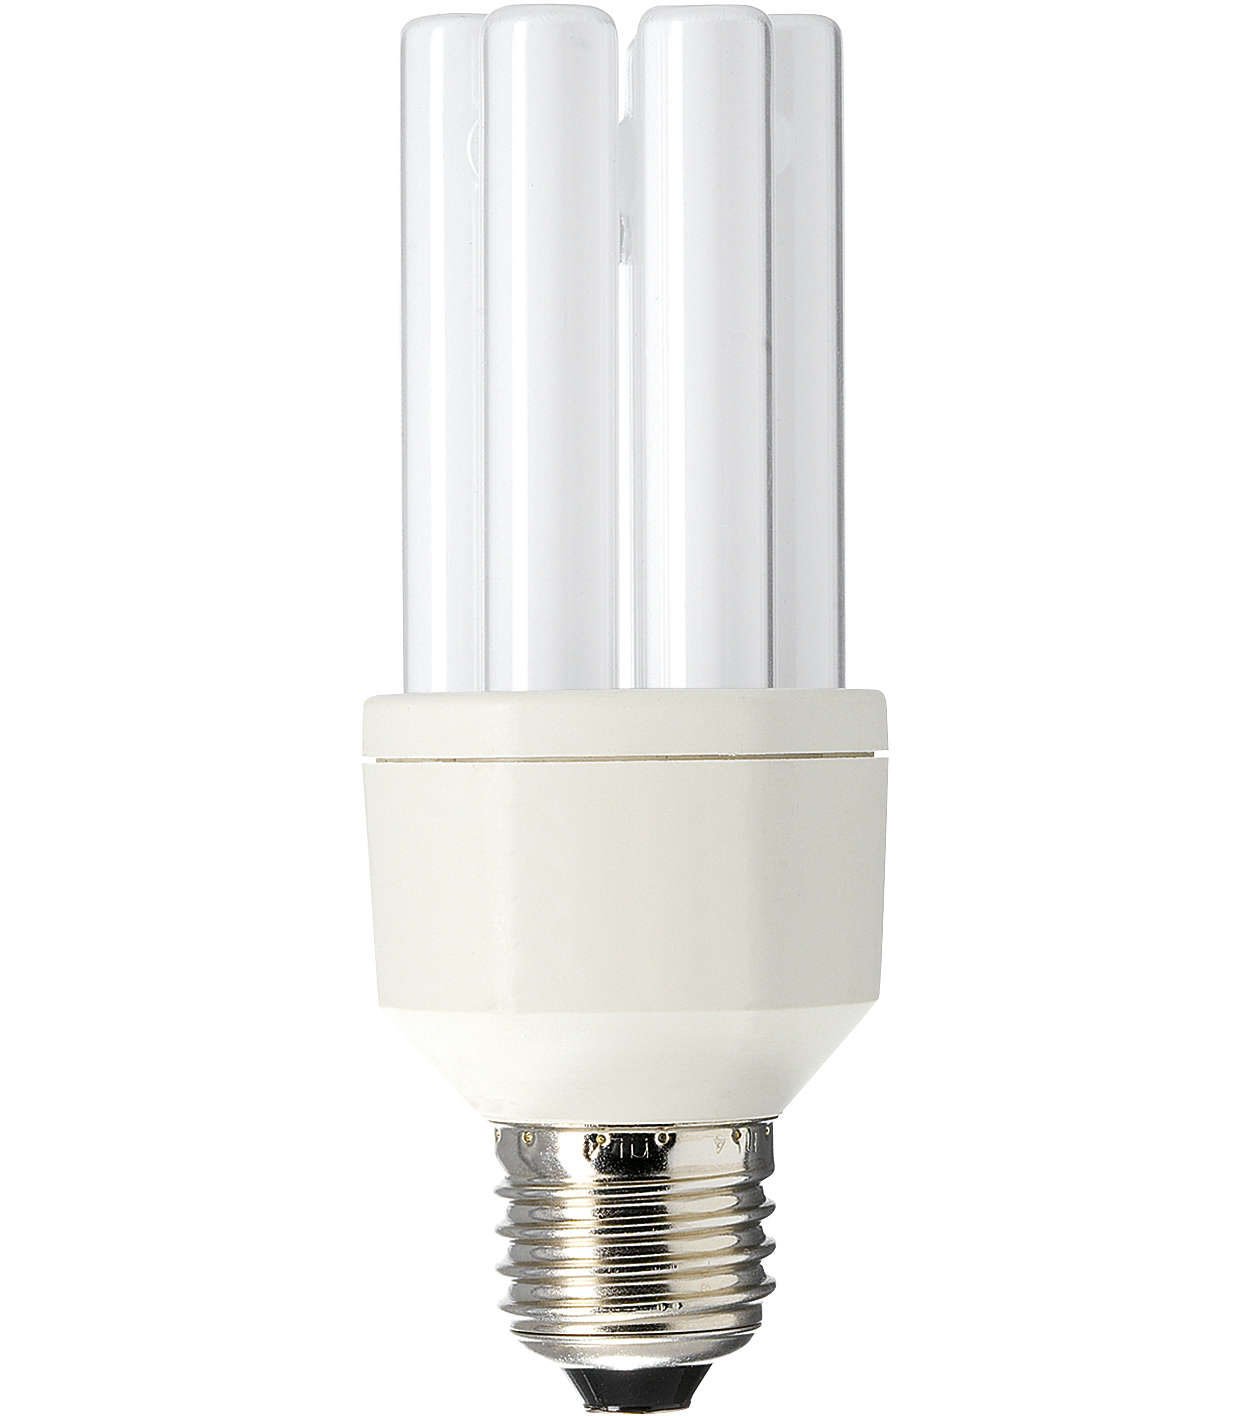 Energy saving lamps designed for stairway lighting